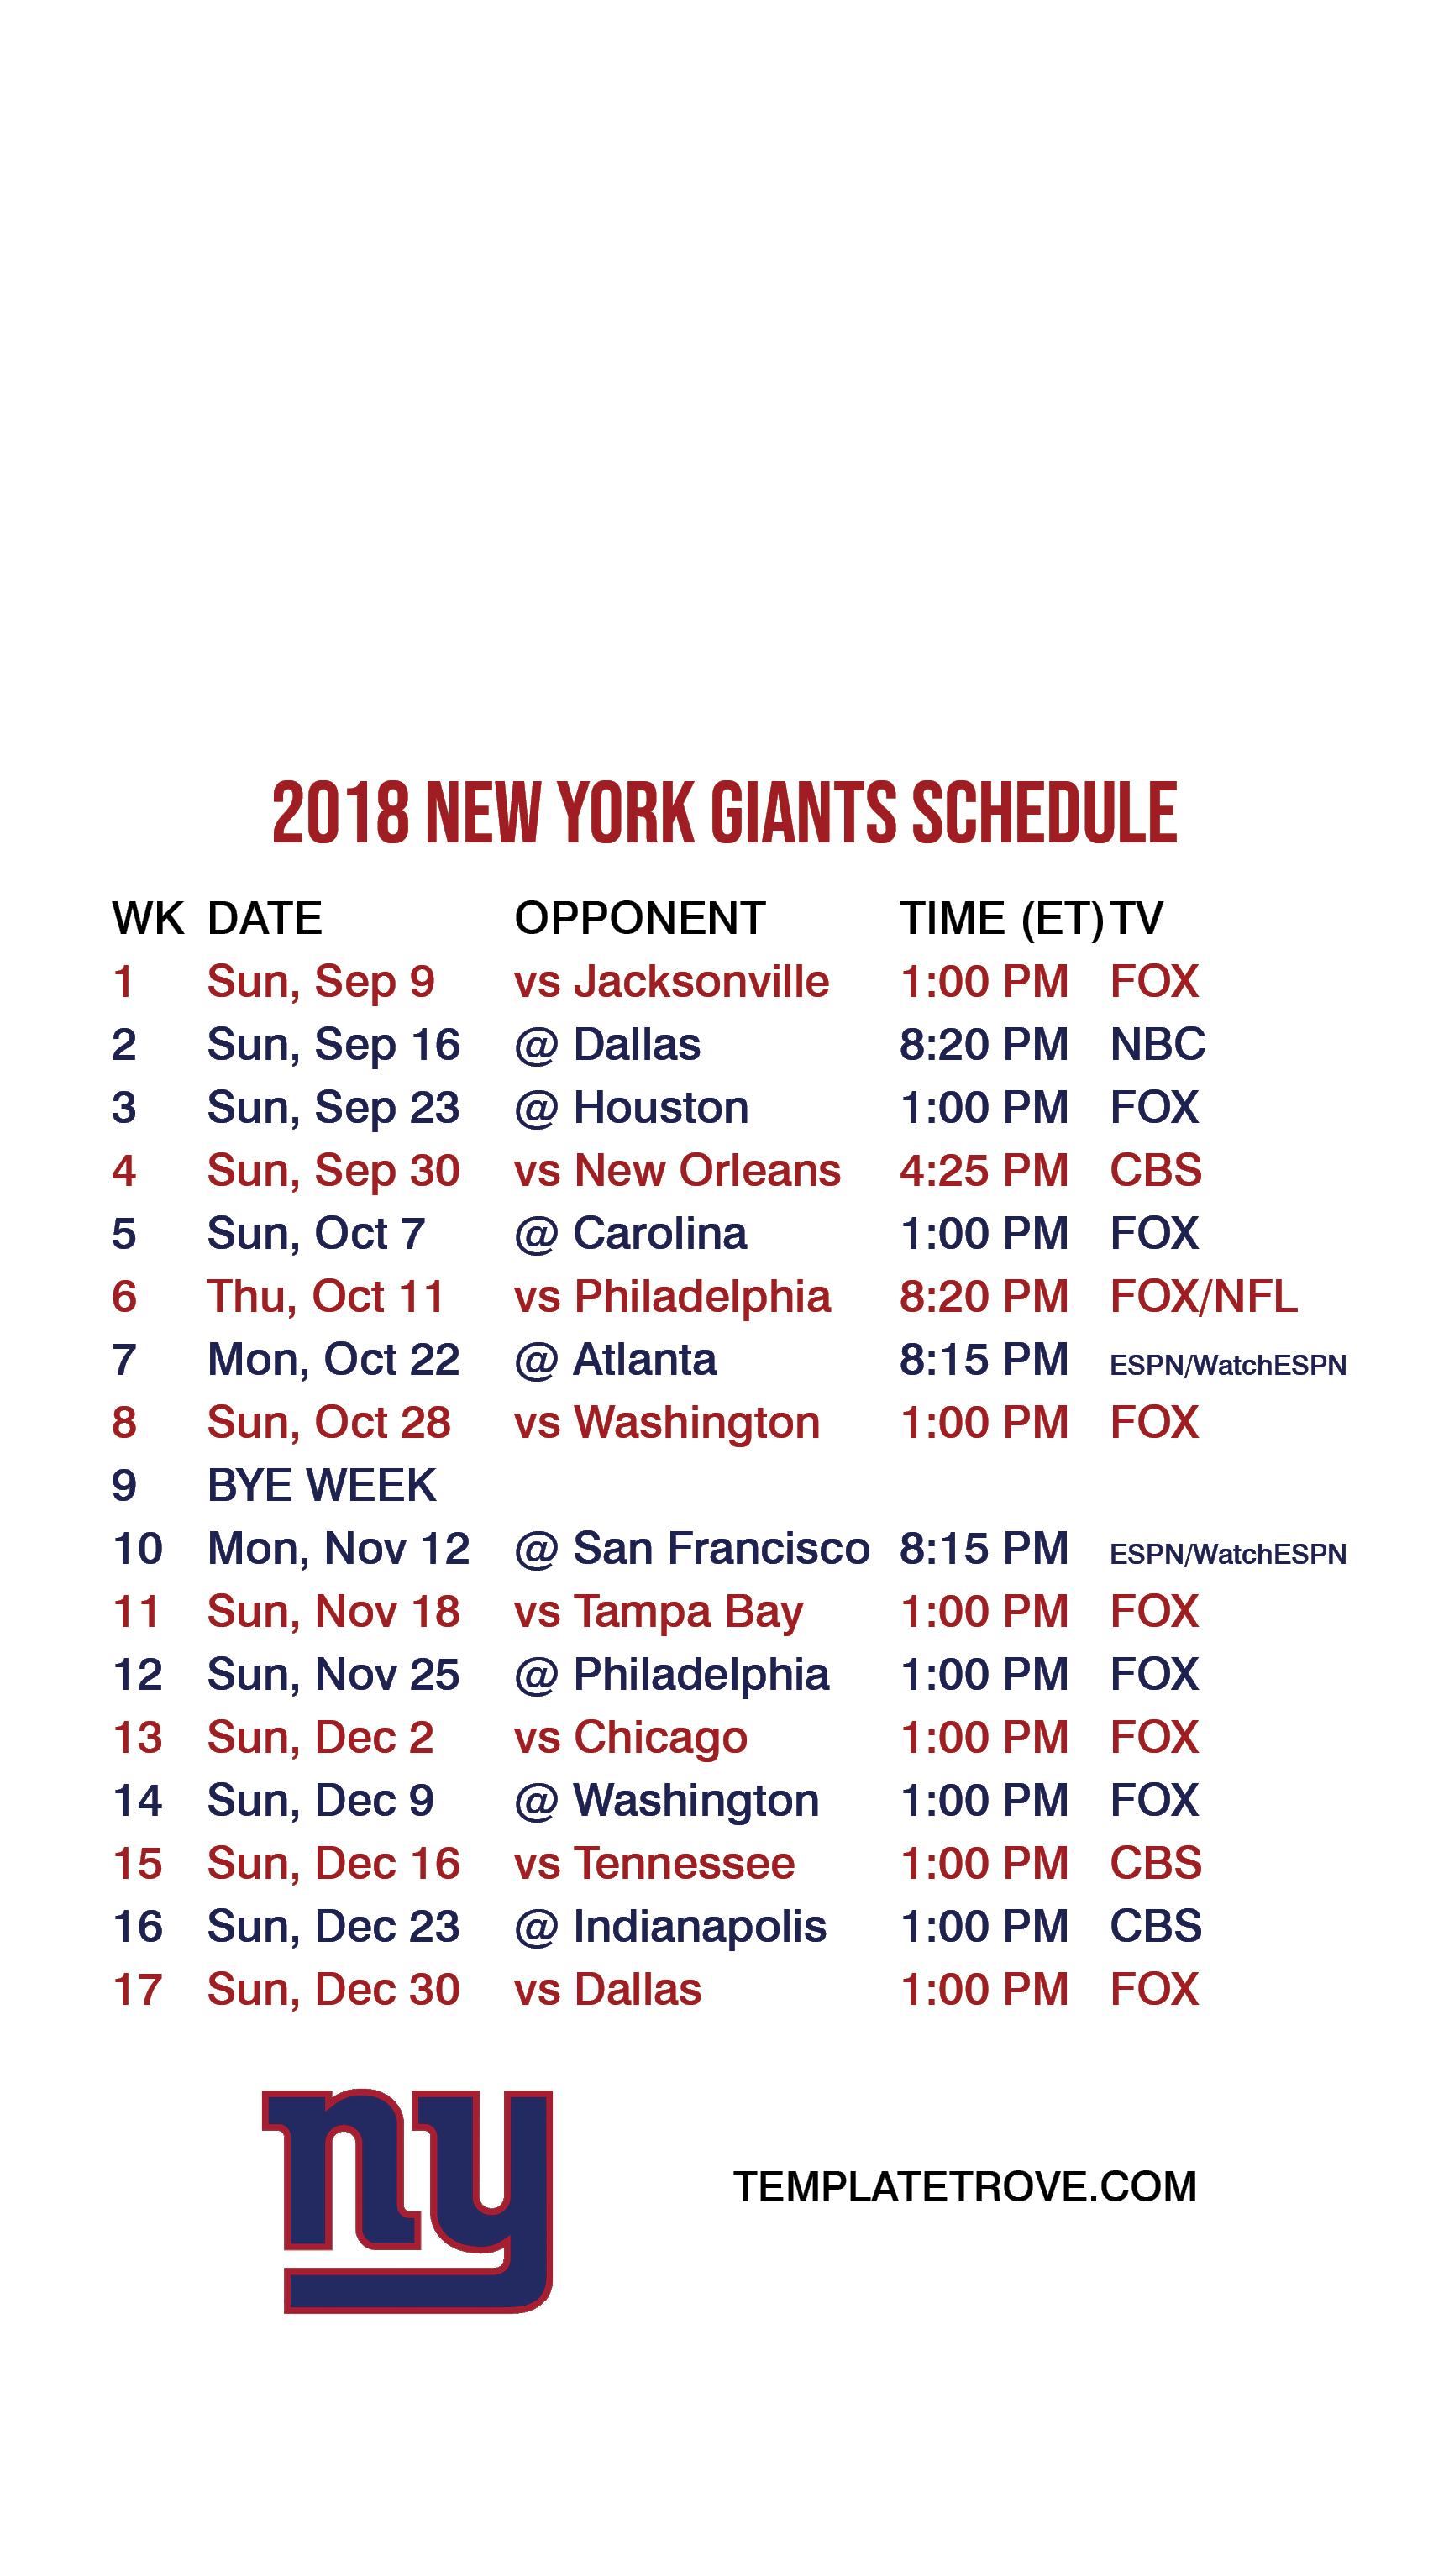 2018 2019 new york giants lock screen schedule for iphone 6 7 8 plus